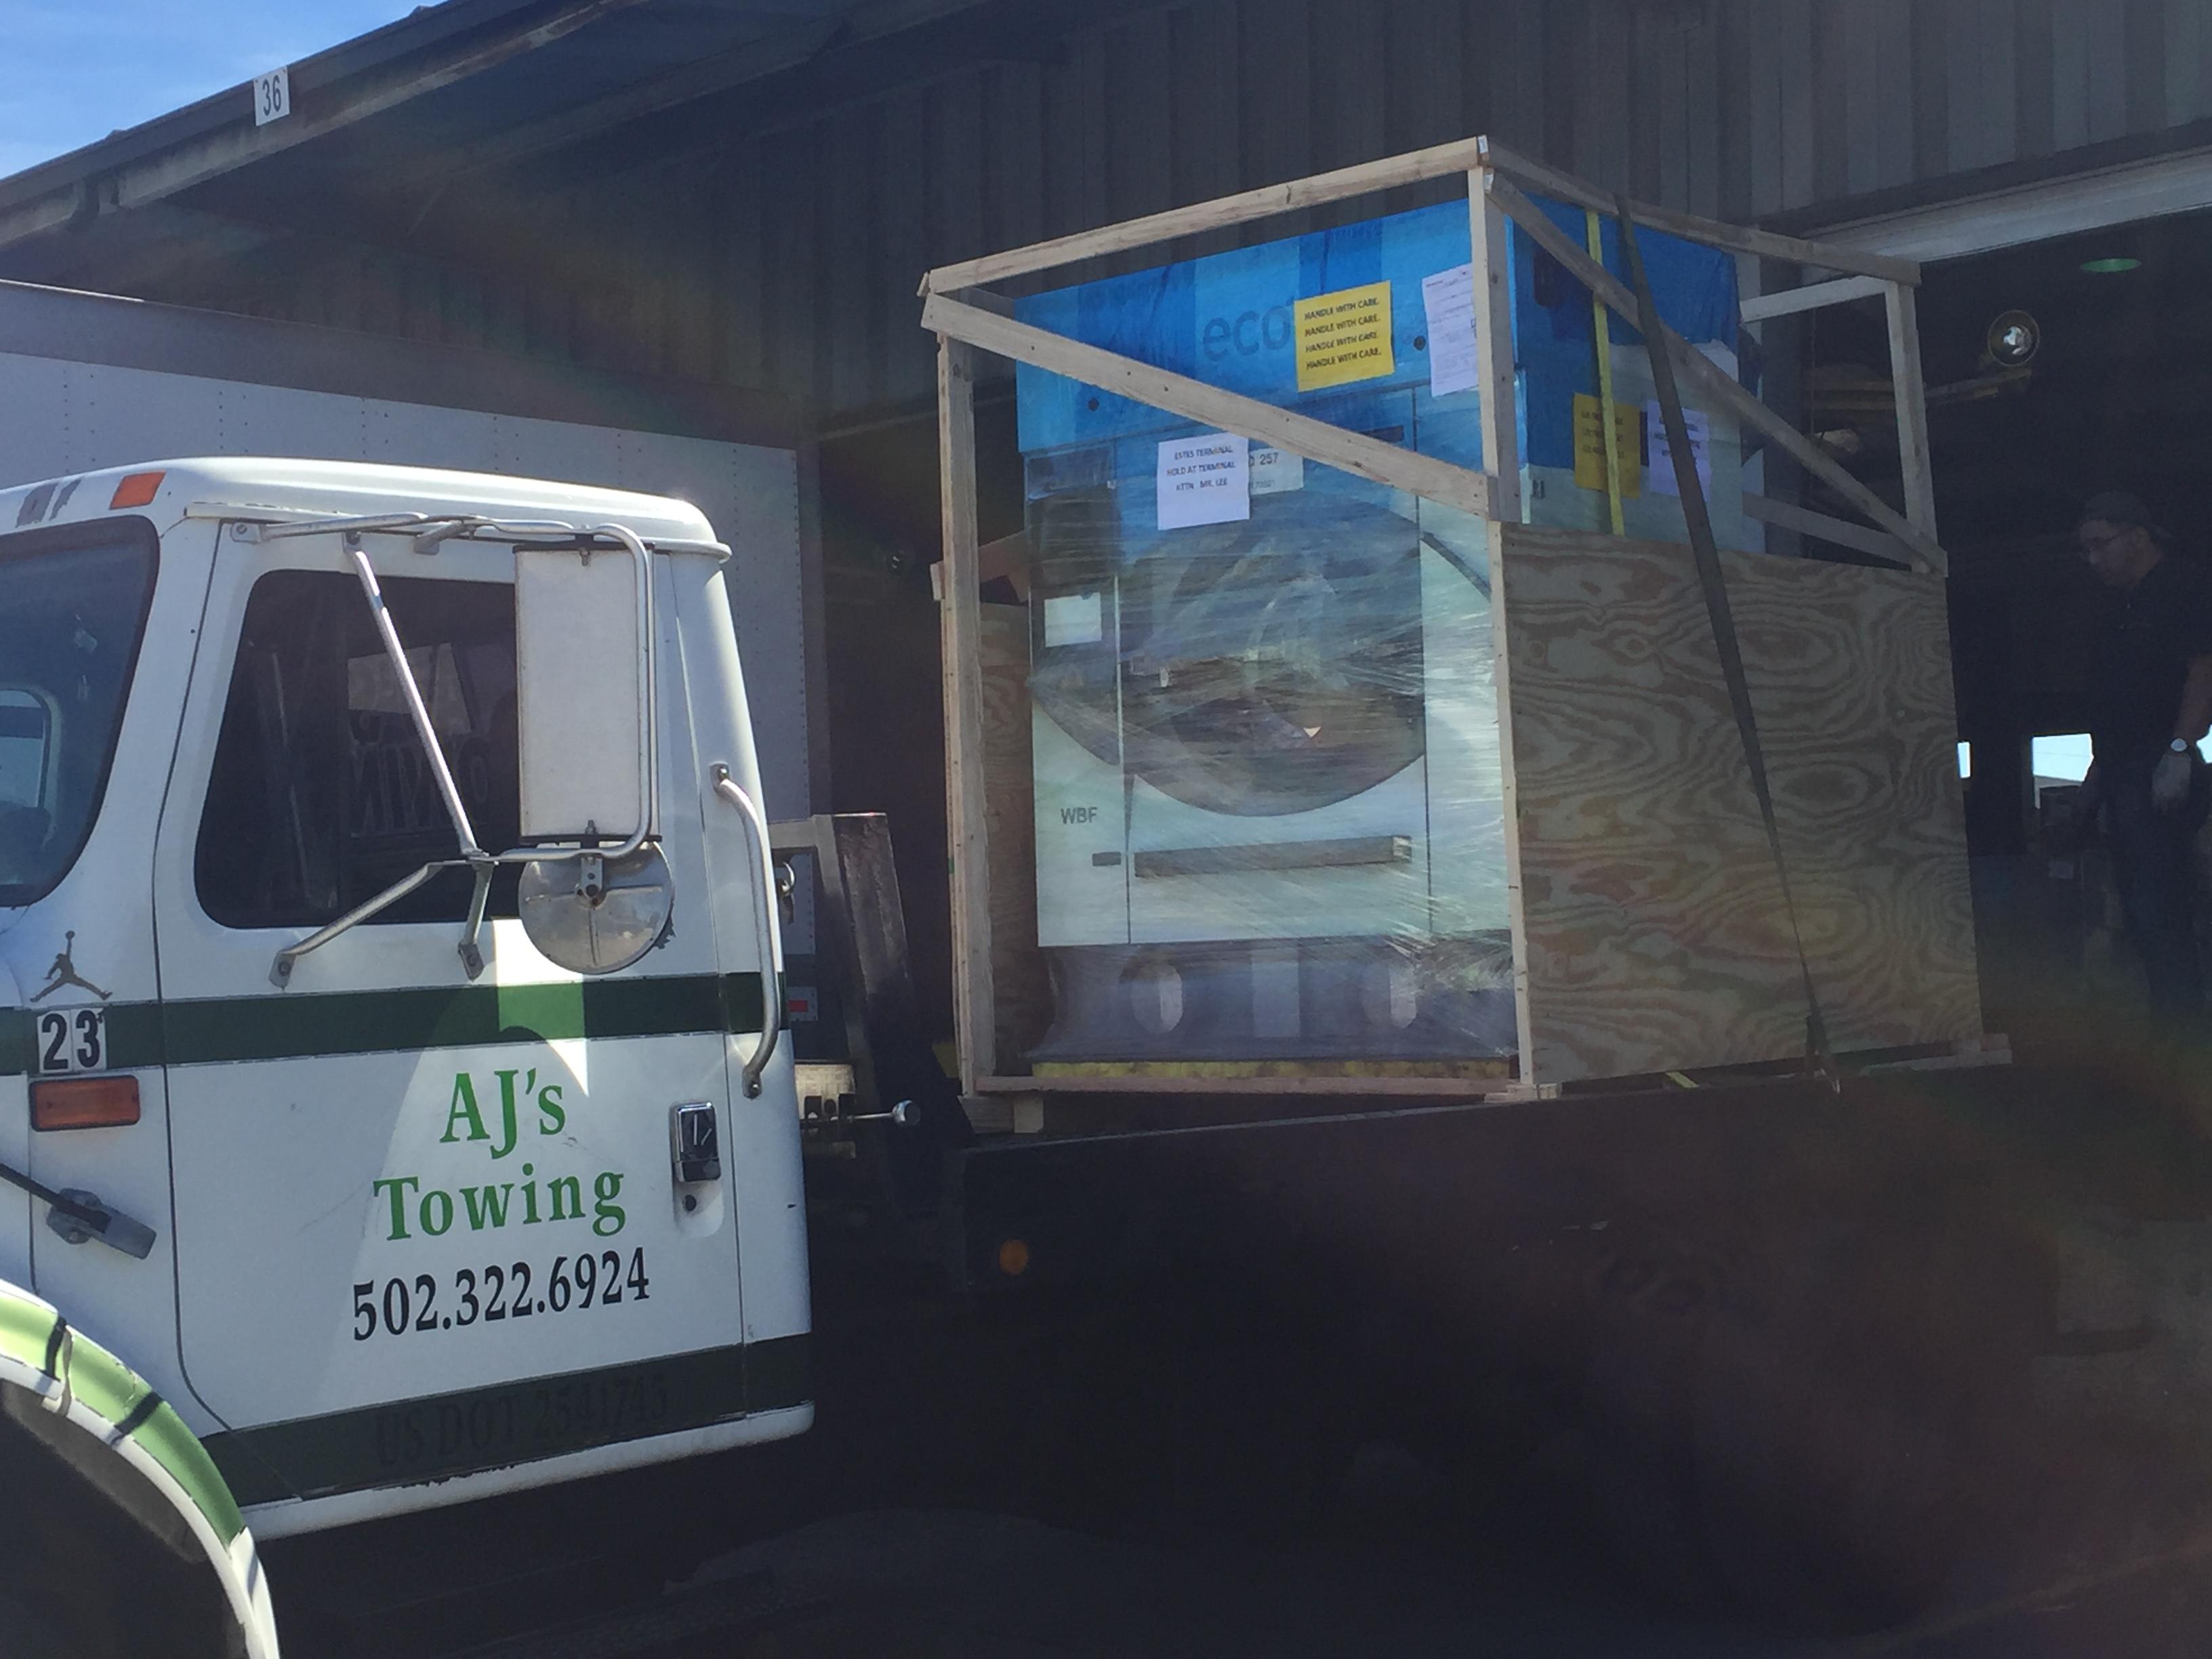 AJ's Towing Service image 27